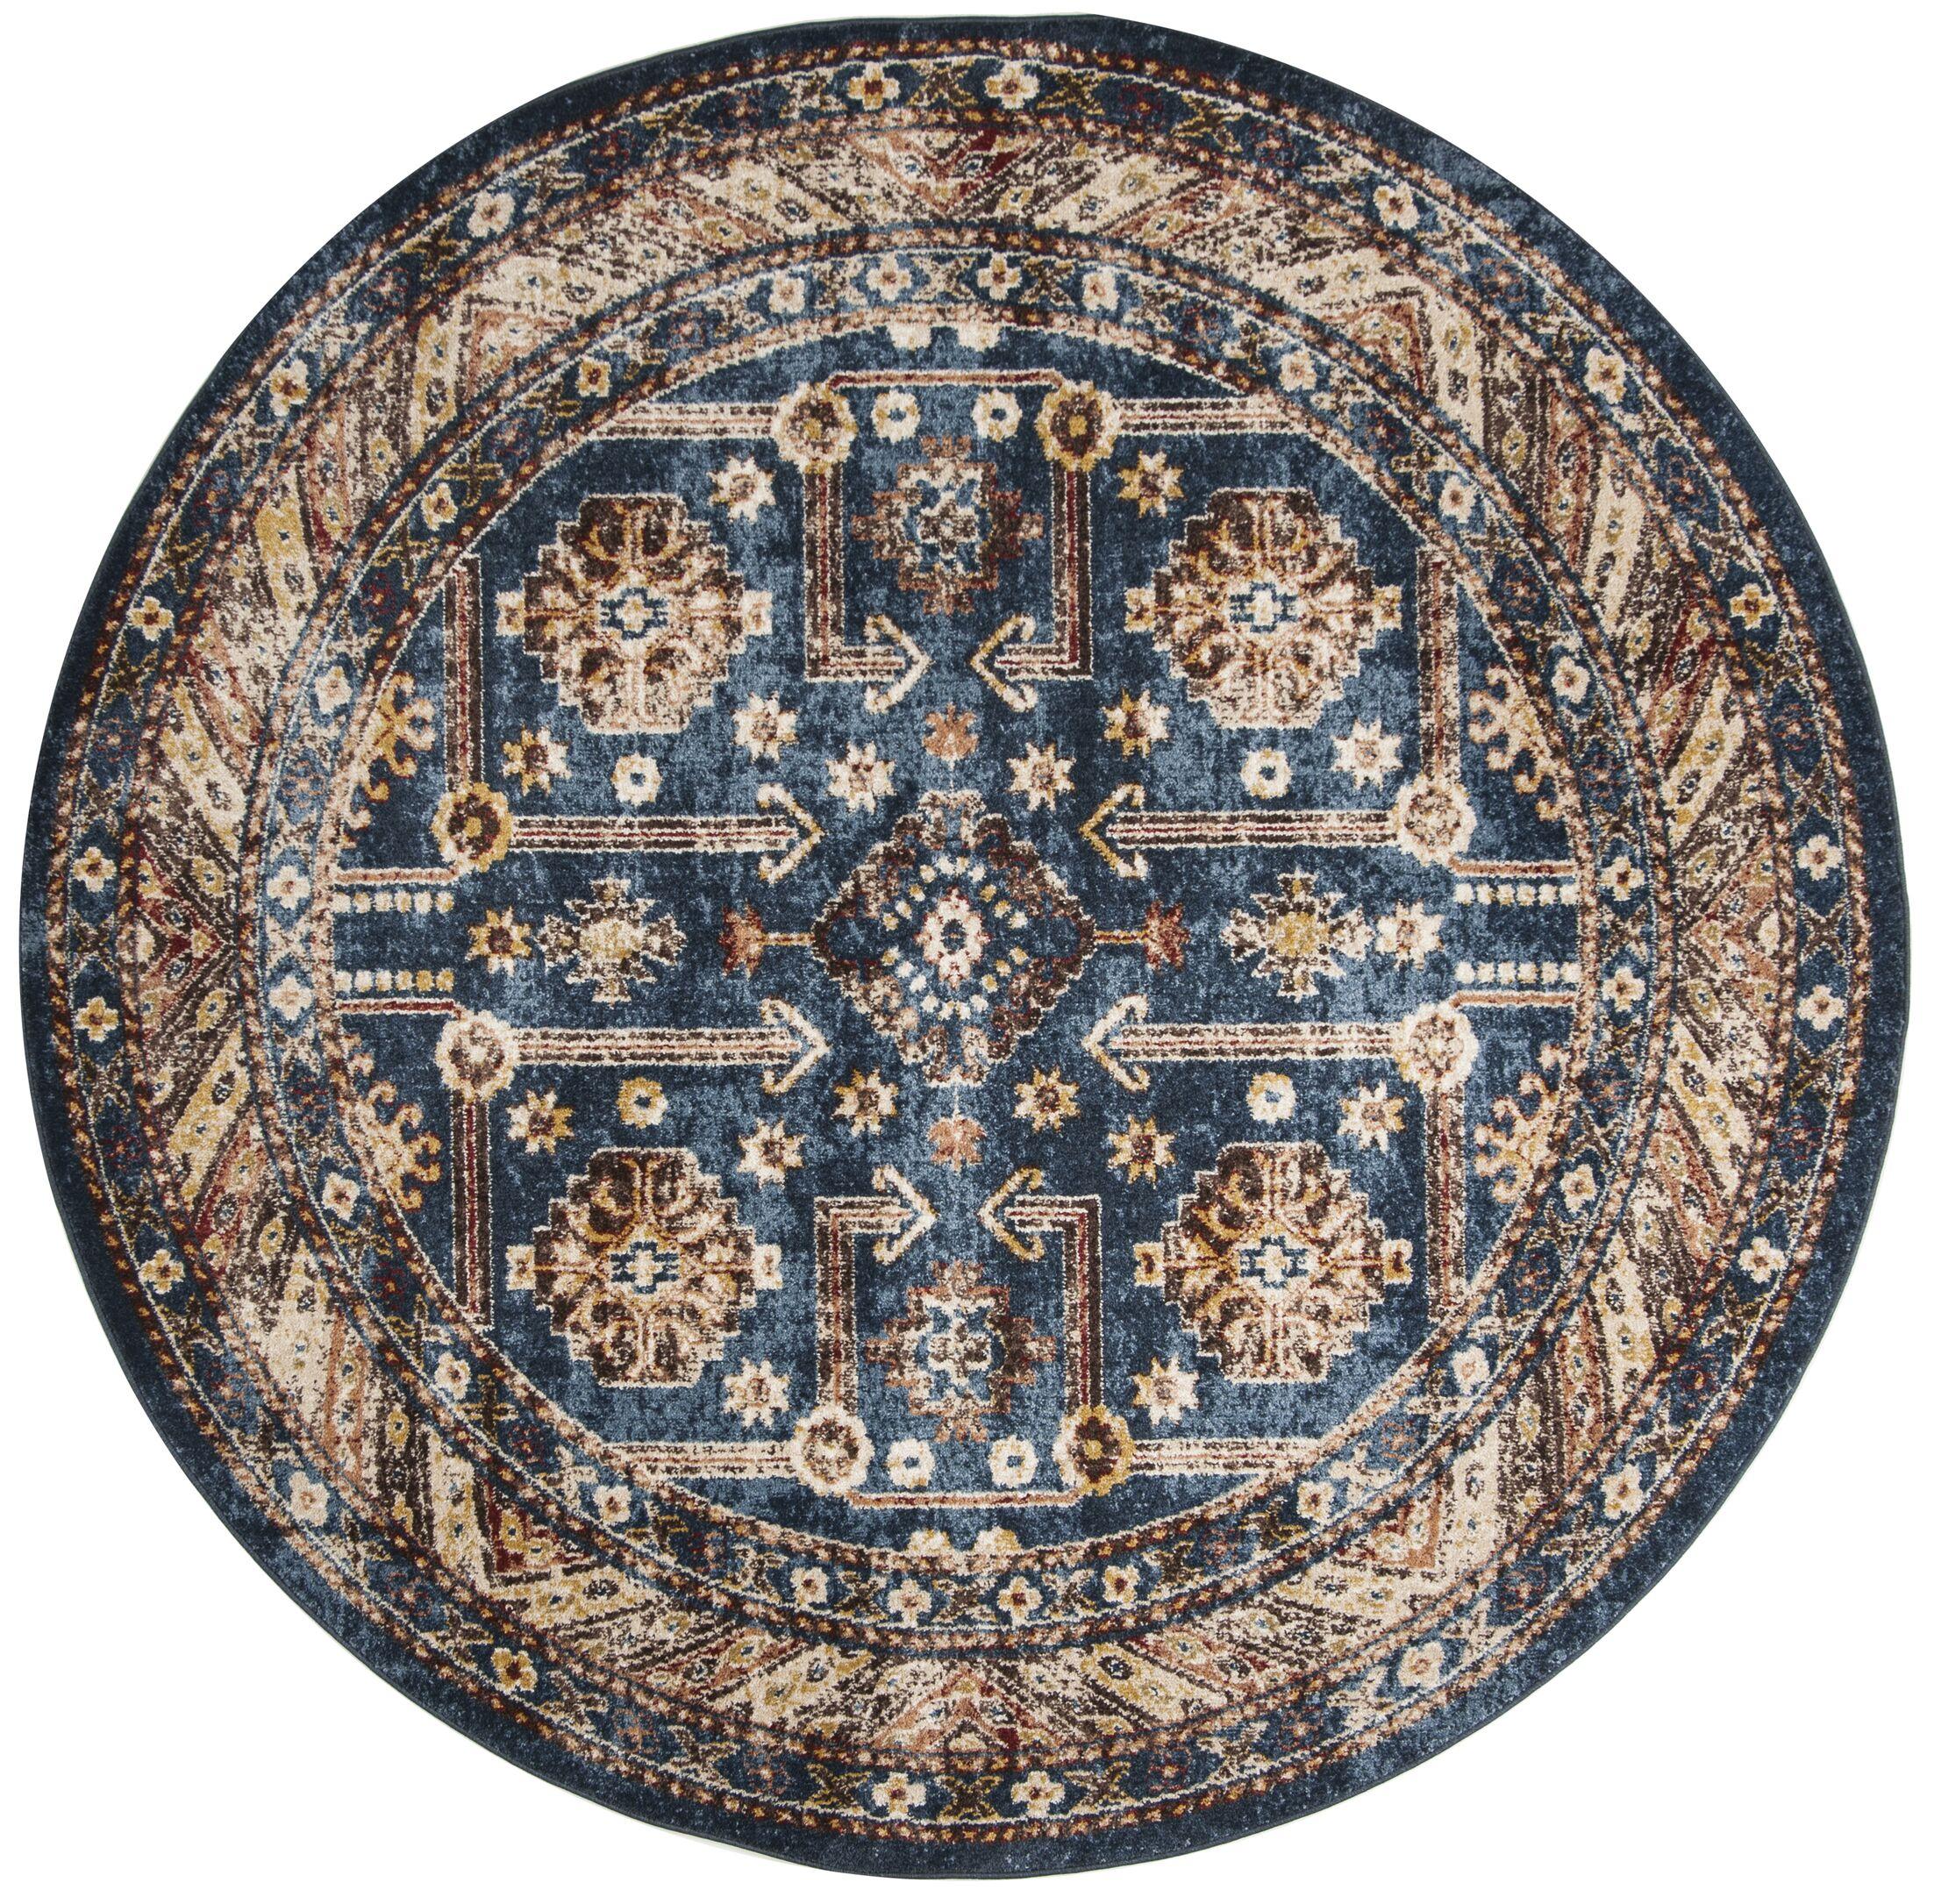 Isanotski Brown/Blue Area Rug Rug Size: Round 6'7